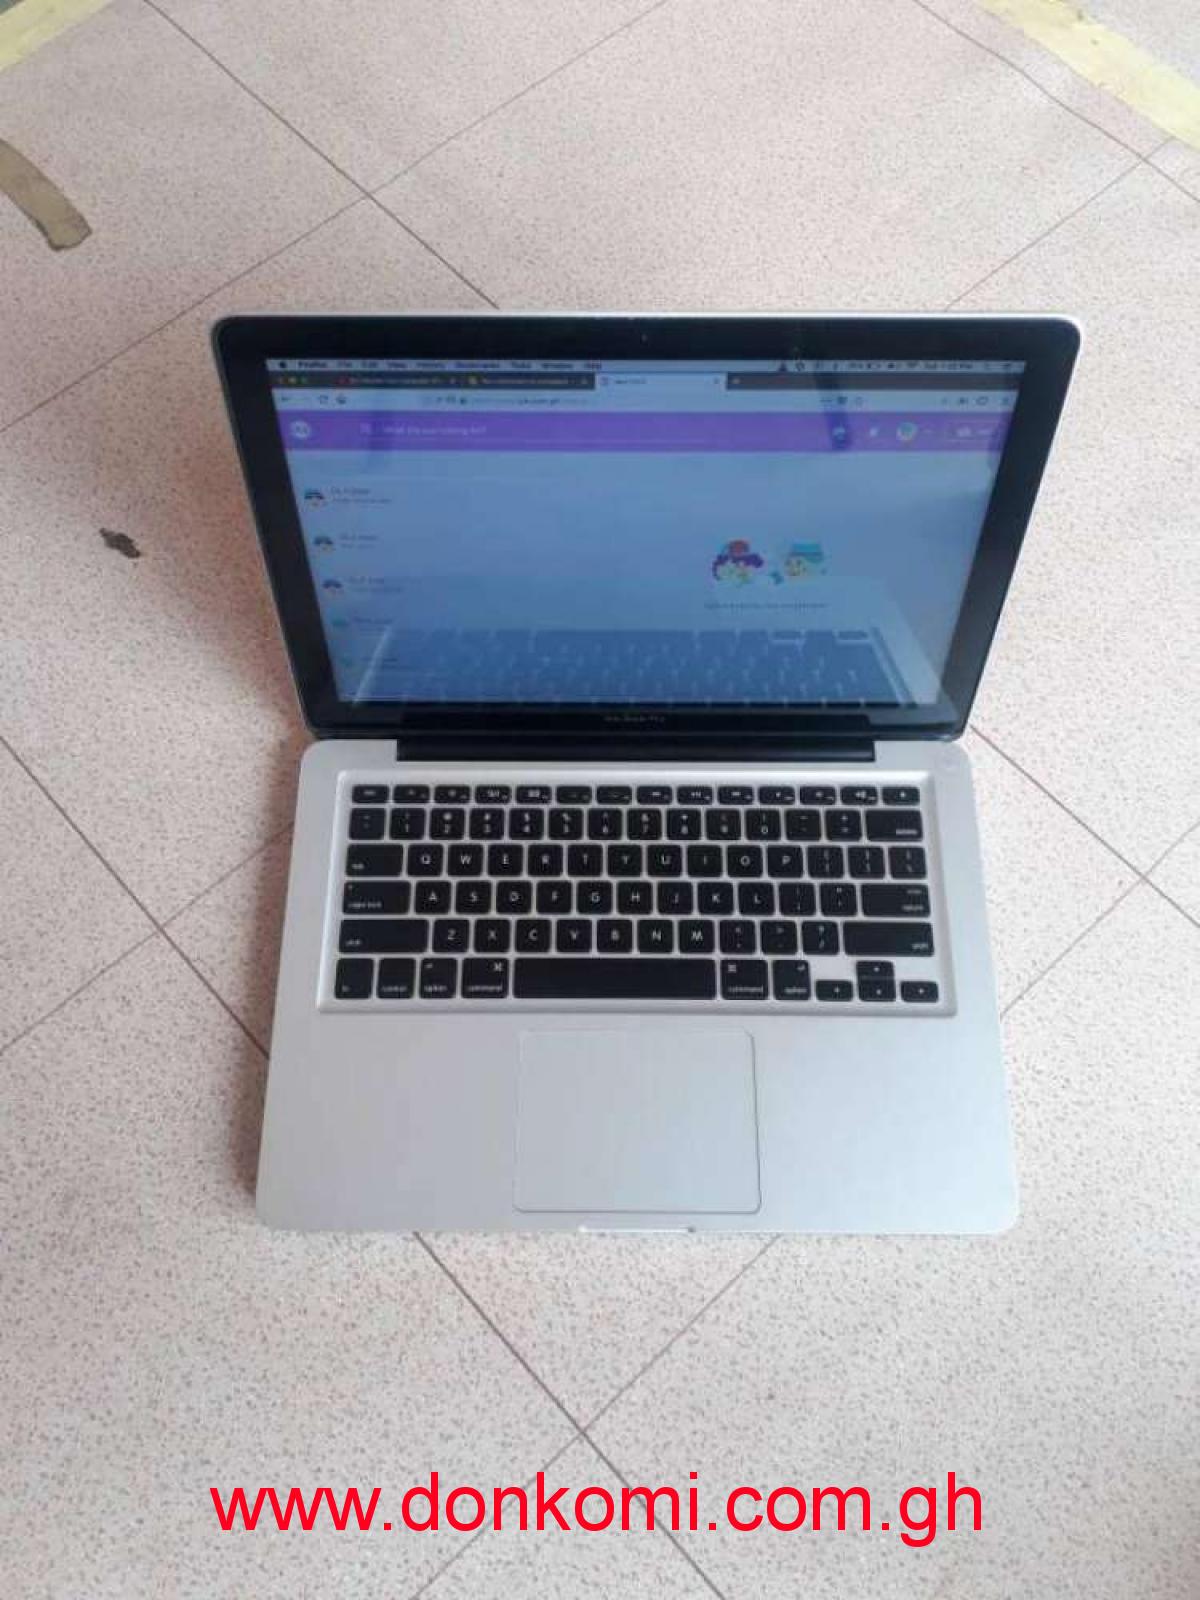 Macbook pro. Intel core i5.